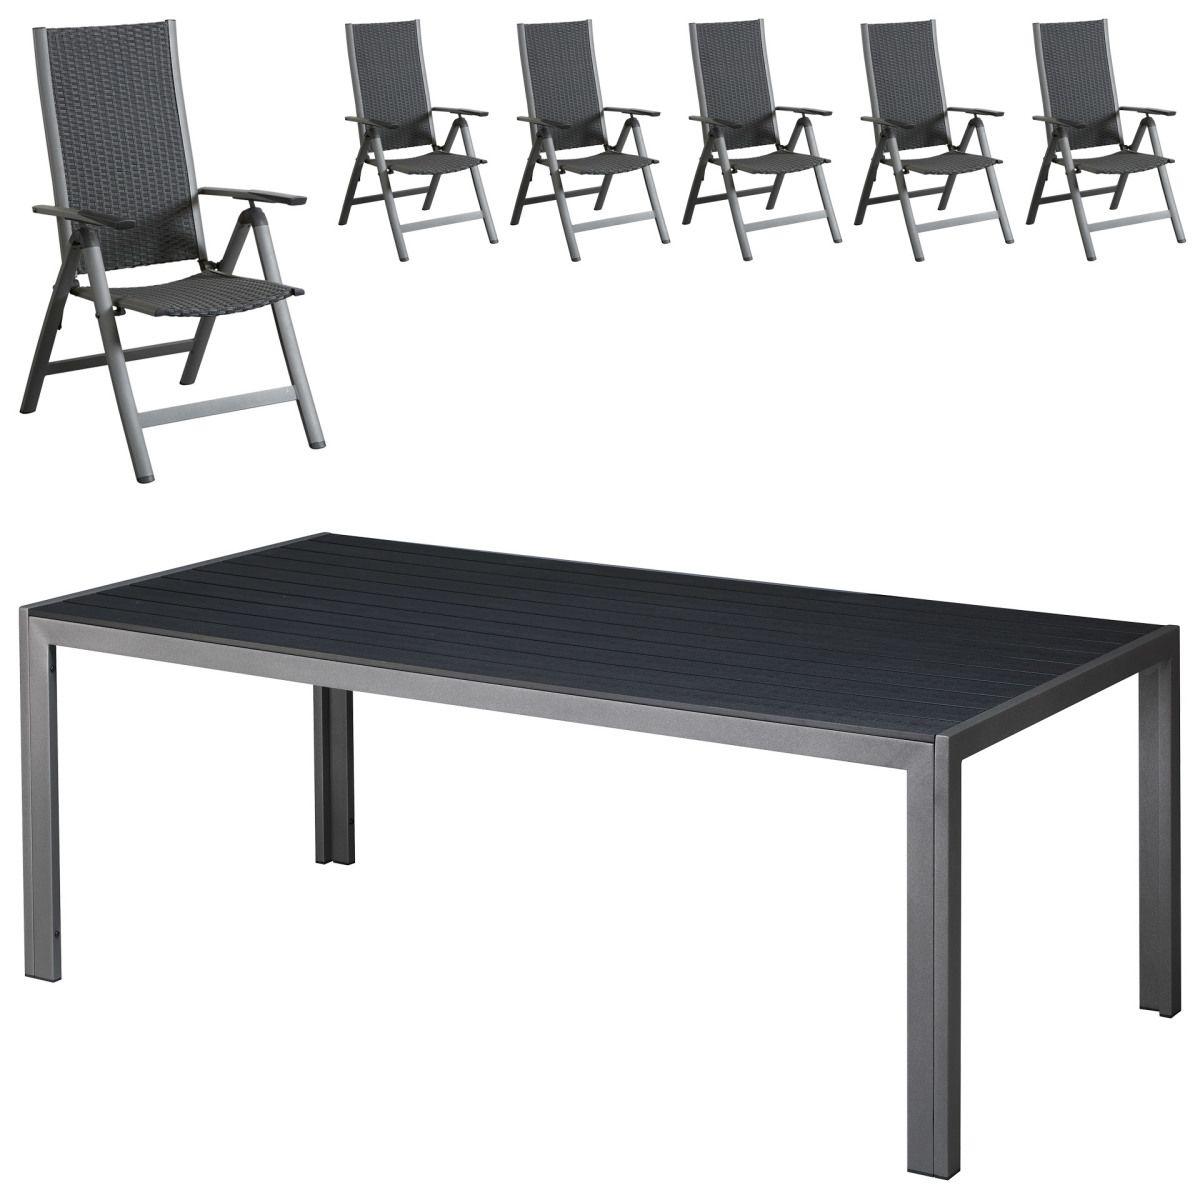 Gartenmöbel-Set Las Vegas/Pasadena (100x205, 6 Stühle, schwarz ...